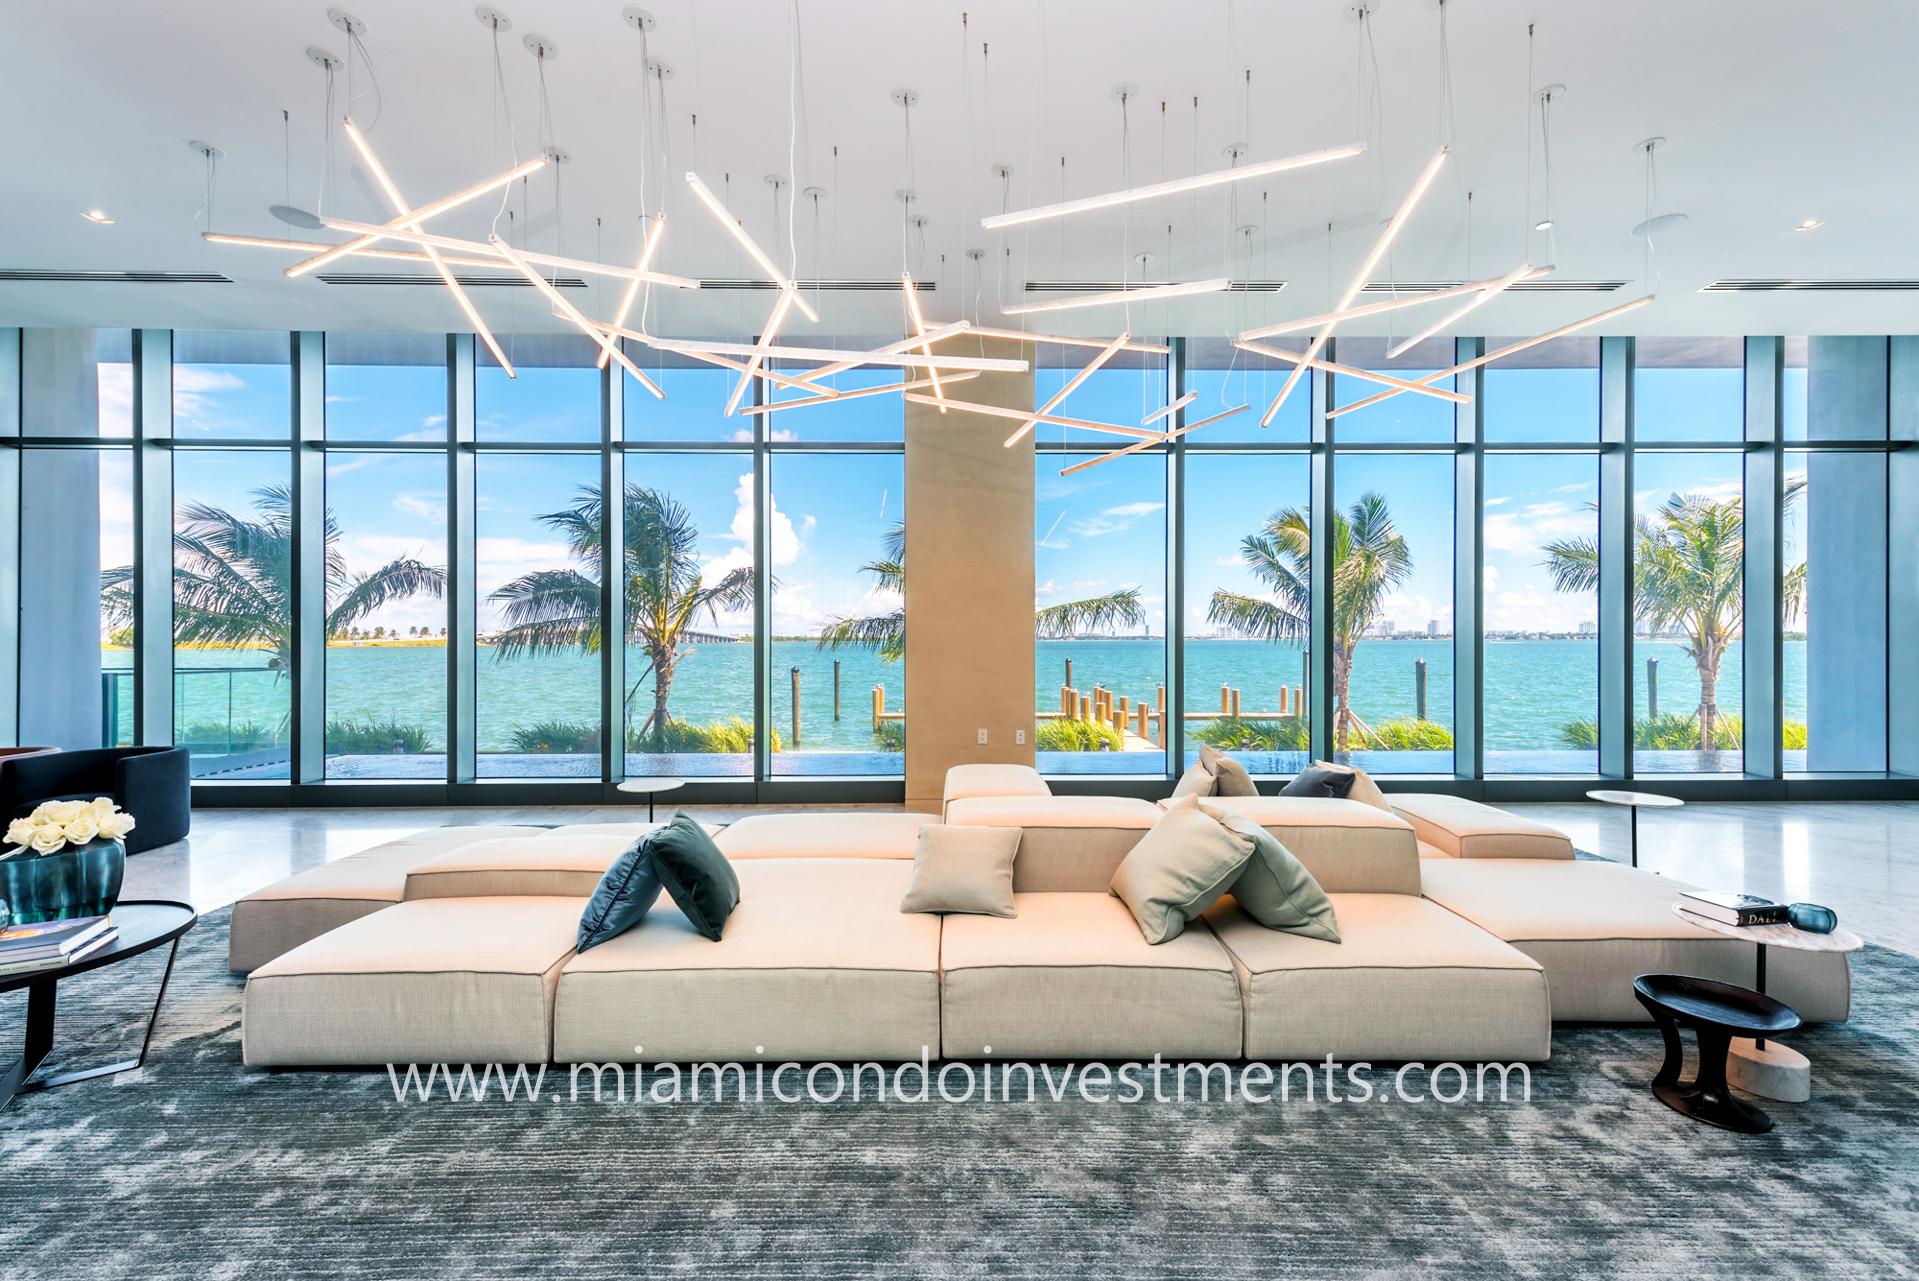 One Paraiso Miami lobby